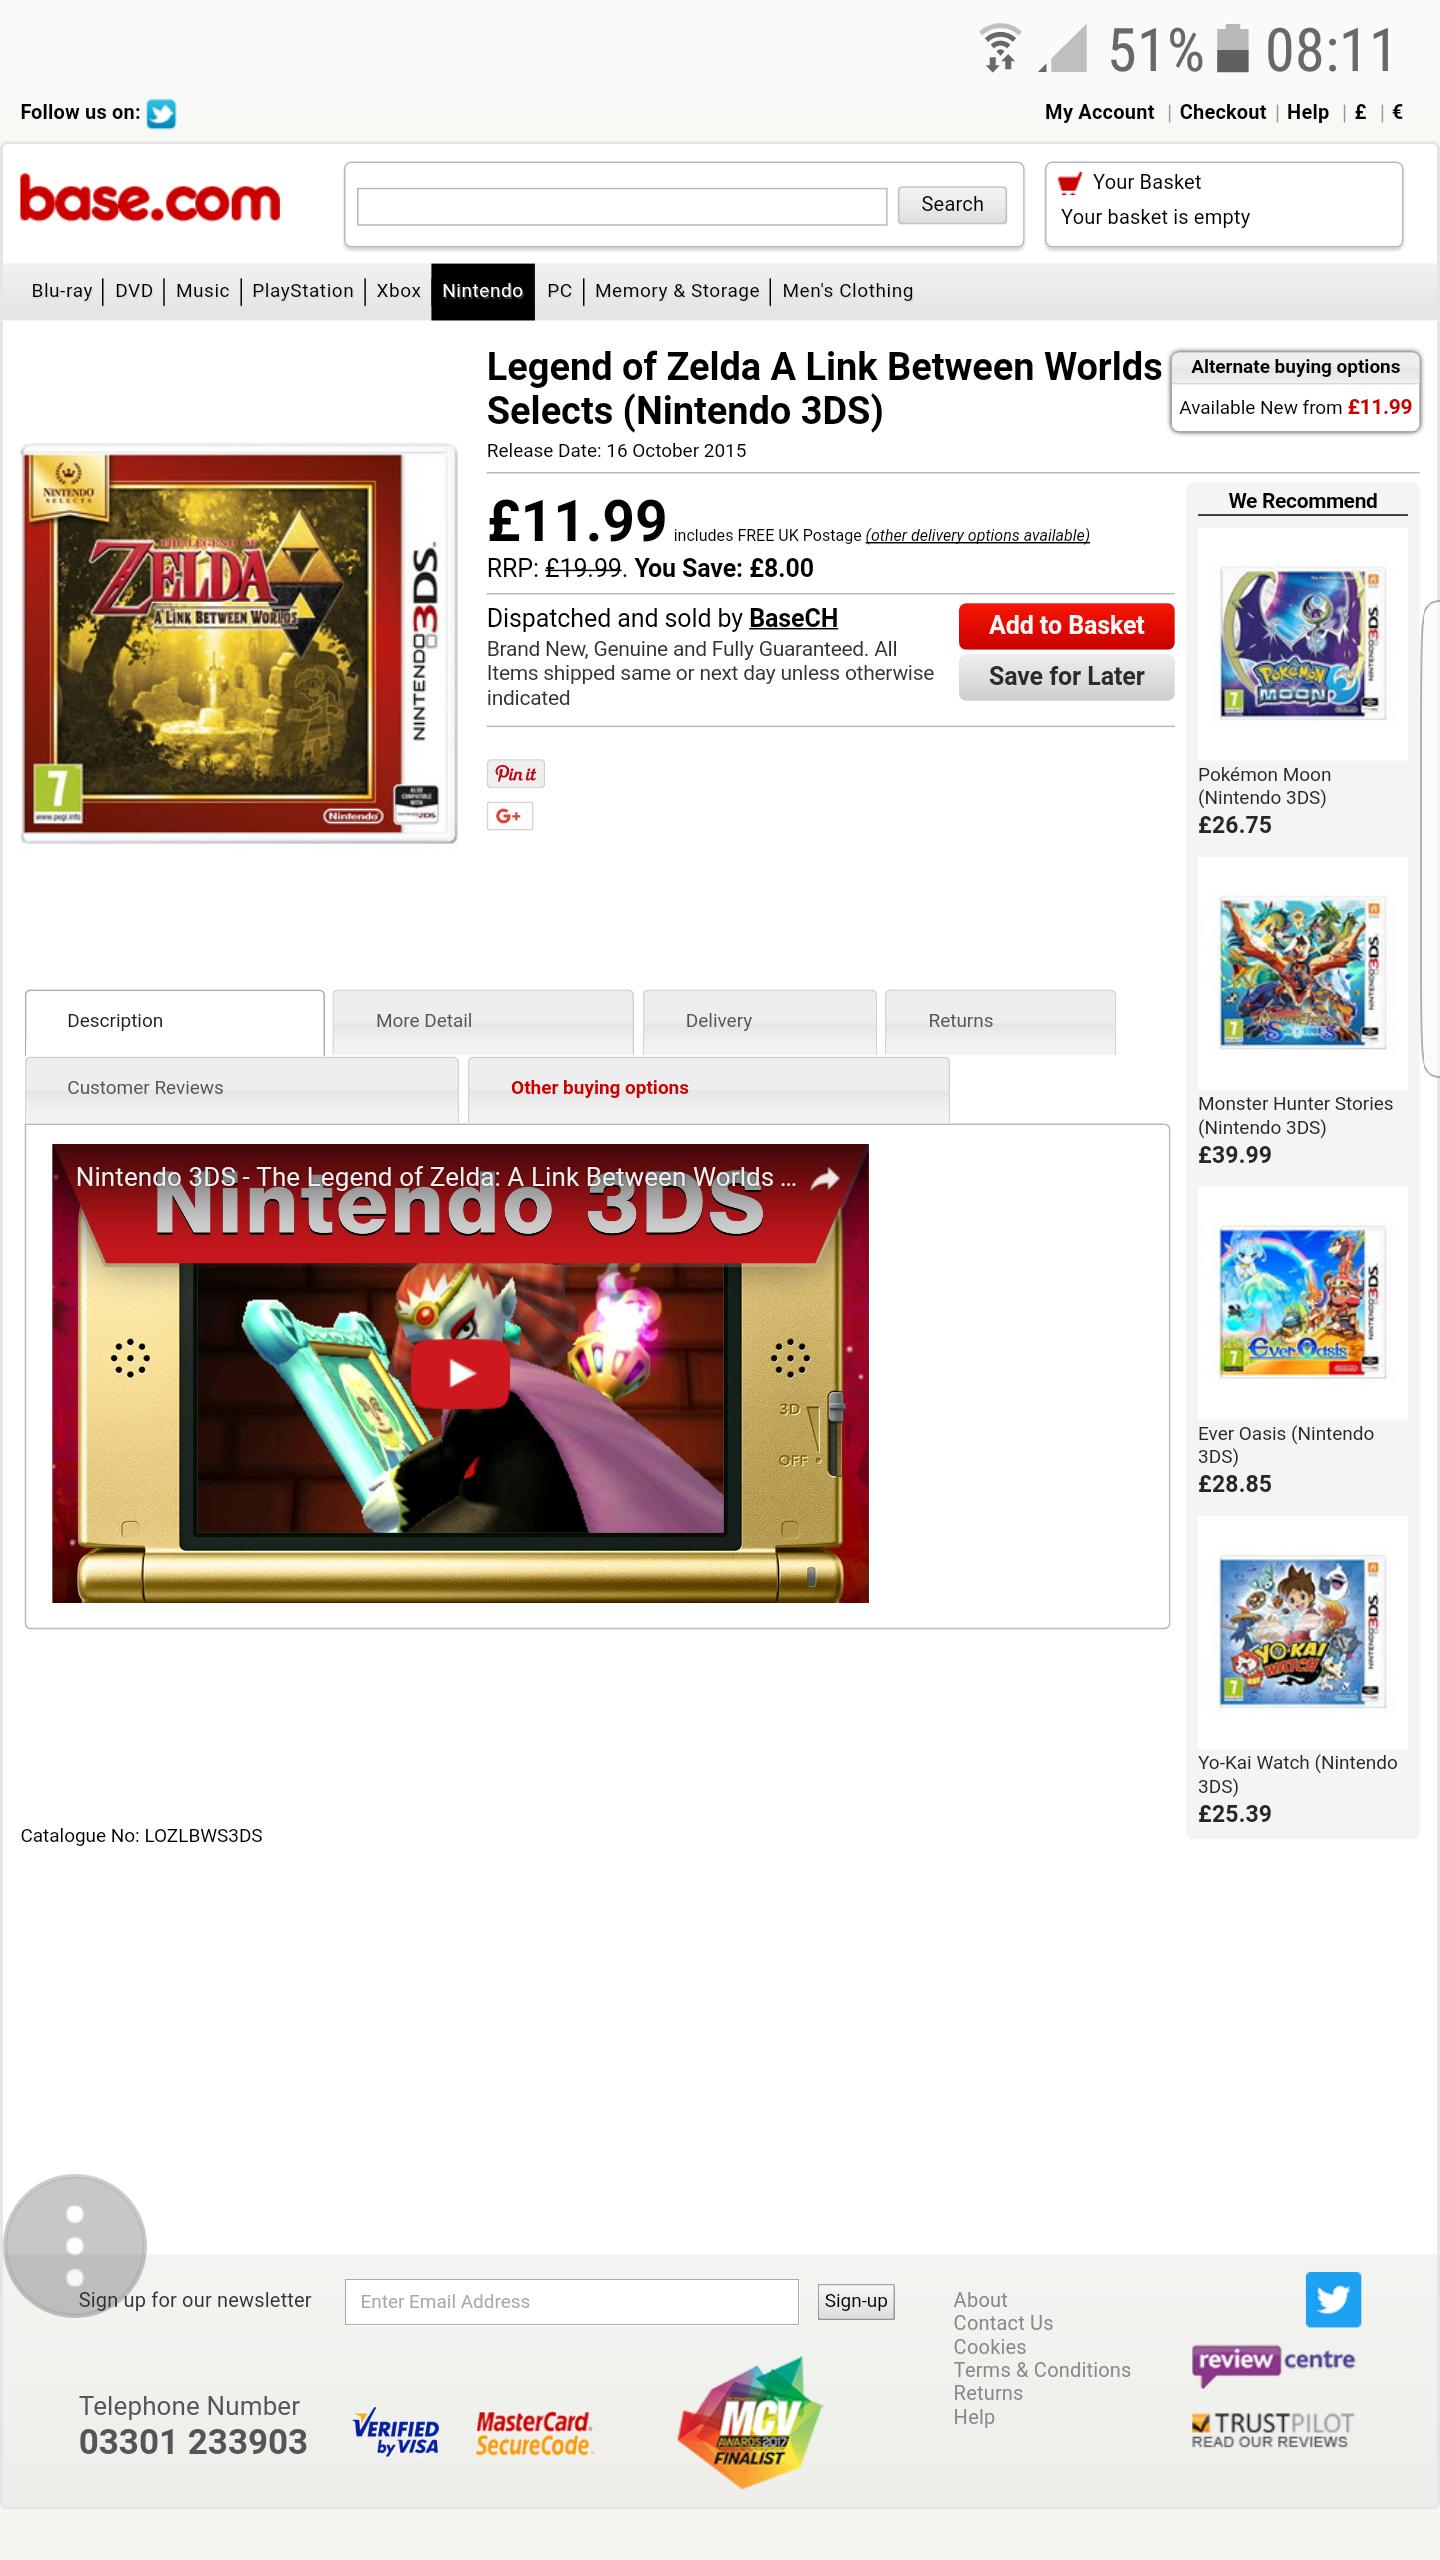 Legend of Zelda A Link Between Worlds Selects (Nintendo 3DS) £11.99 - Base.com